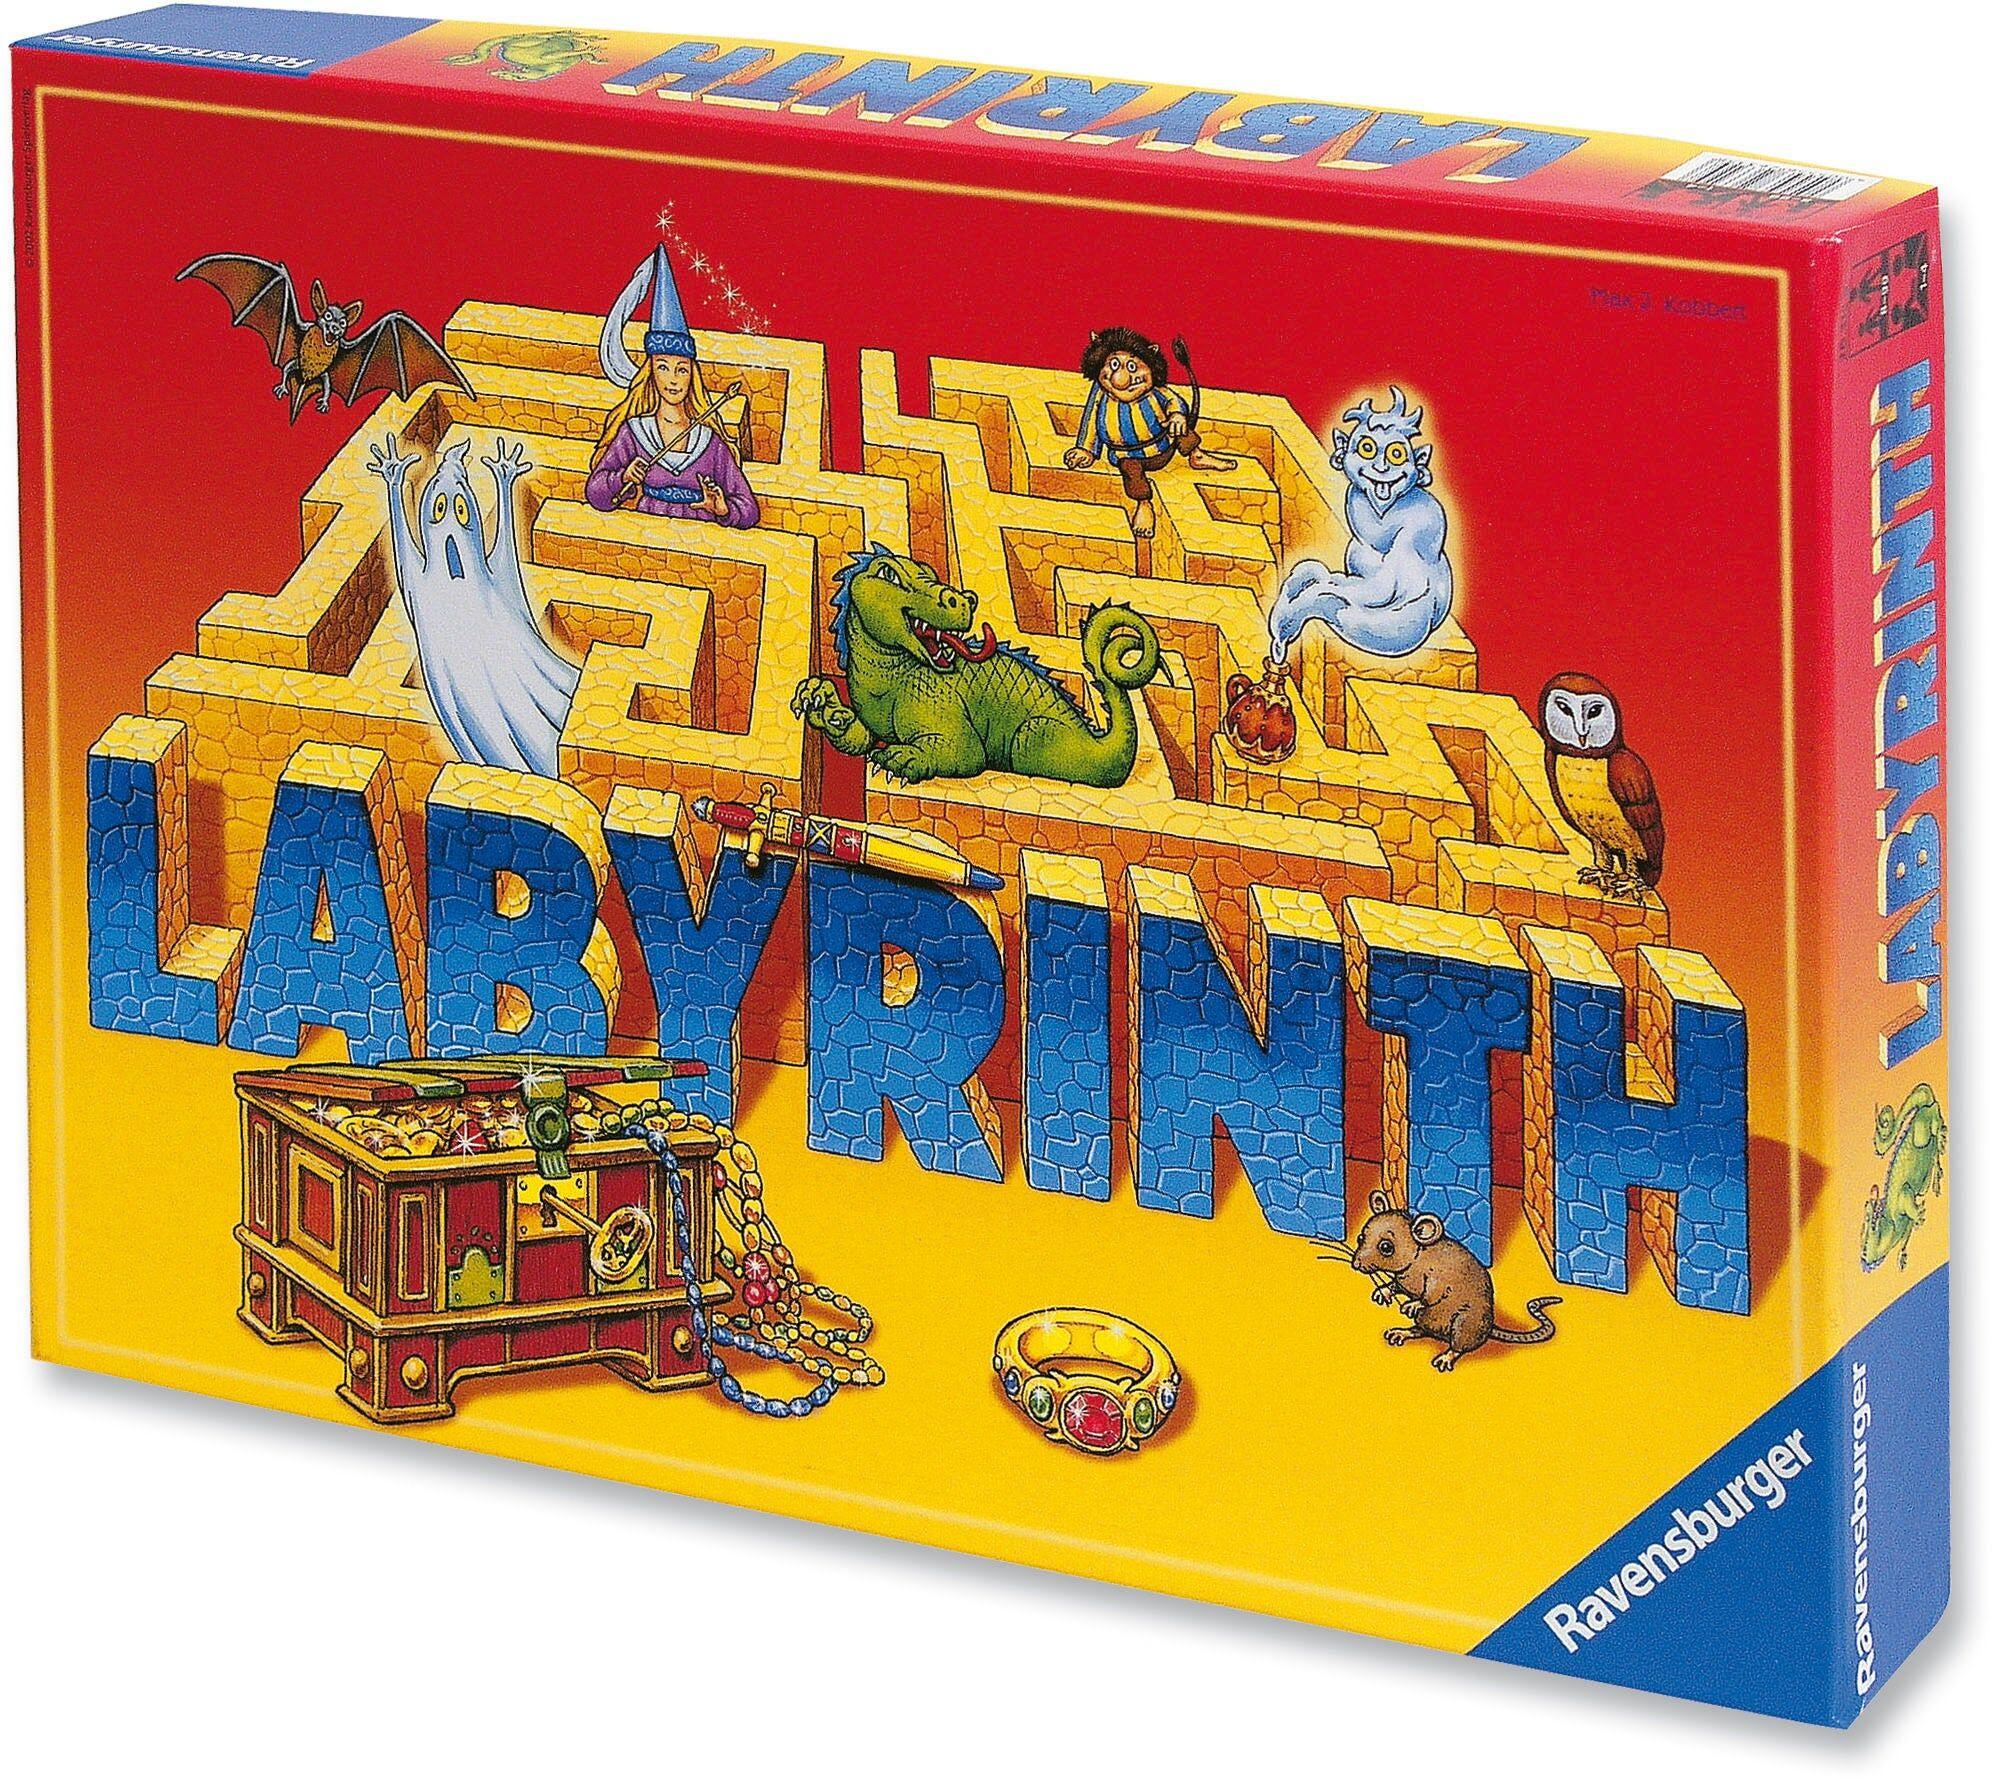 Ravensburger Labyrint